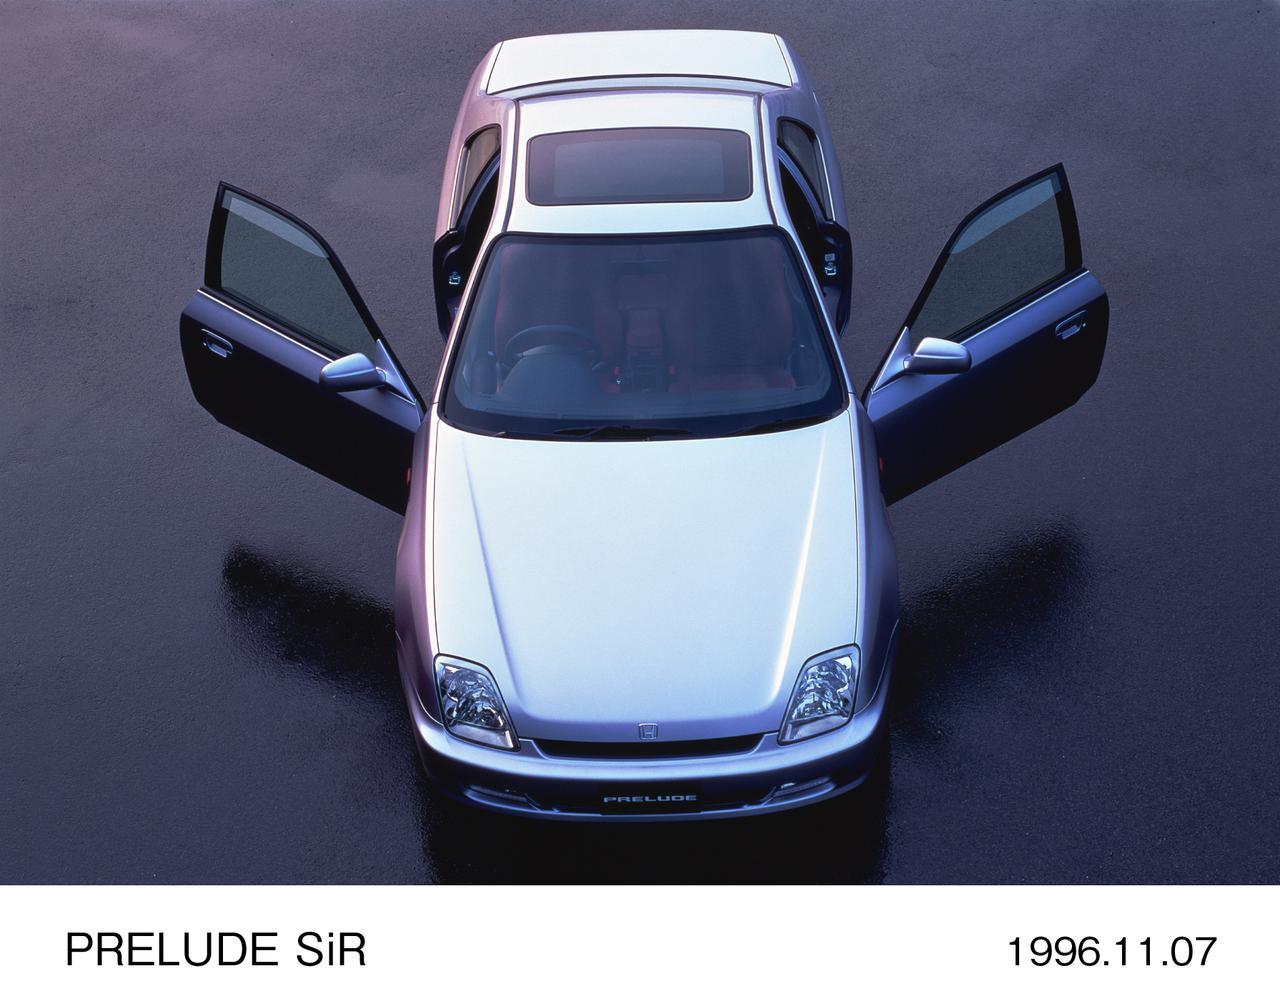 Images : 7番目の画像 - ホンダ プレリュード関連画像(クリックして拡大) - A Little Honda | ア・リトル・ホンダ(リトホン)